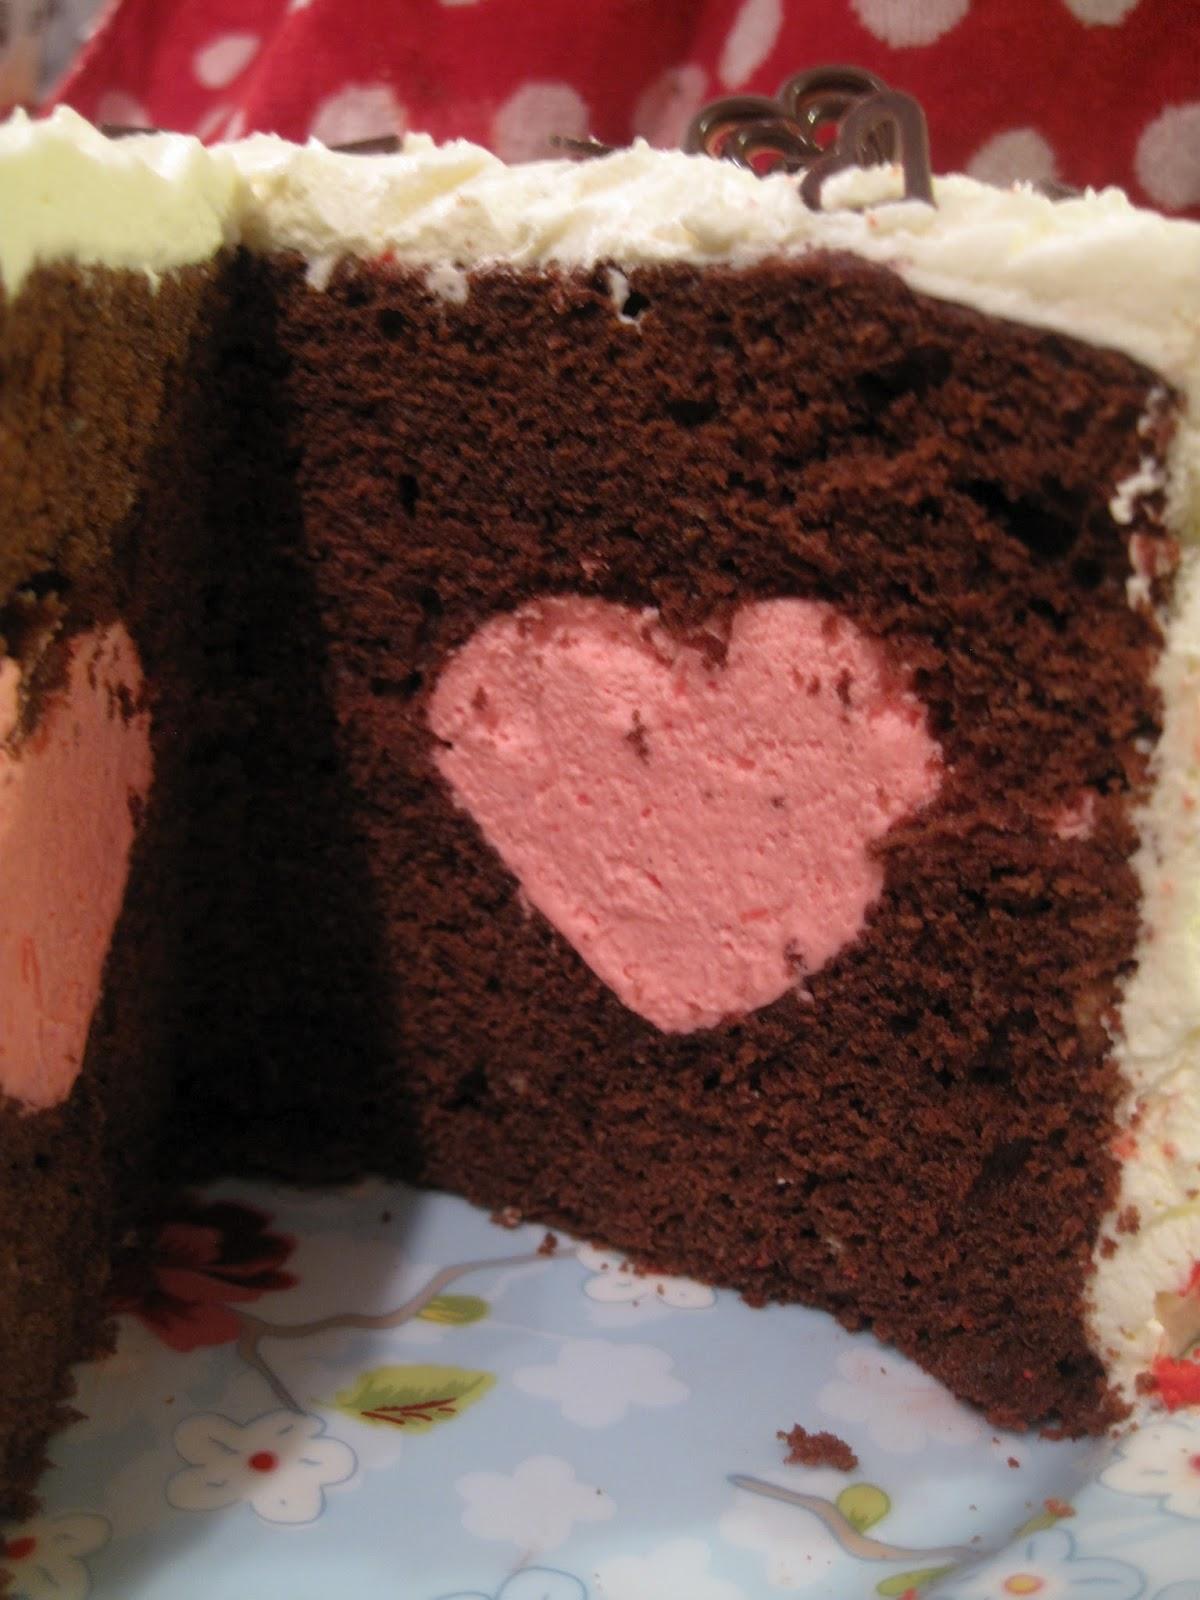 Wilton Heart Tasty Fill Cake A how to gIrL bAkeS